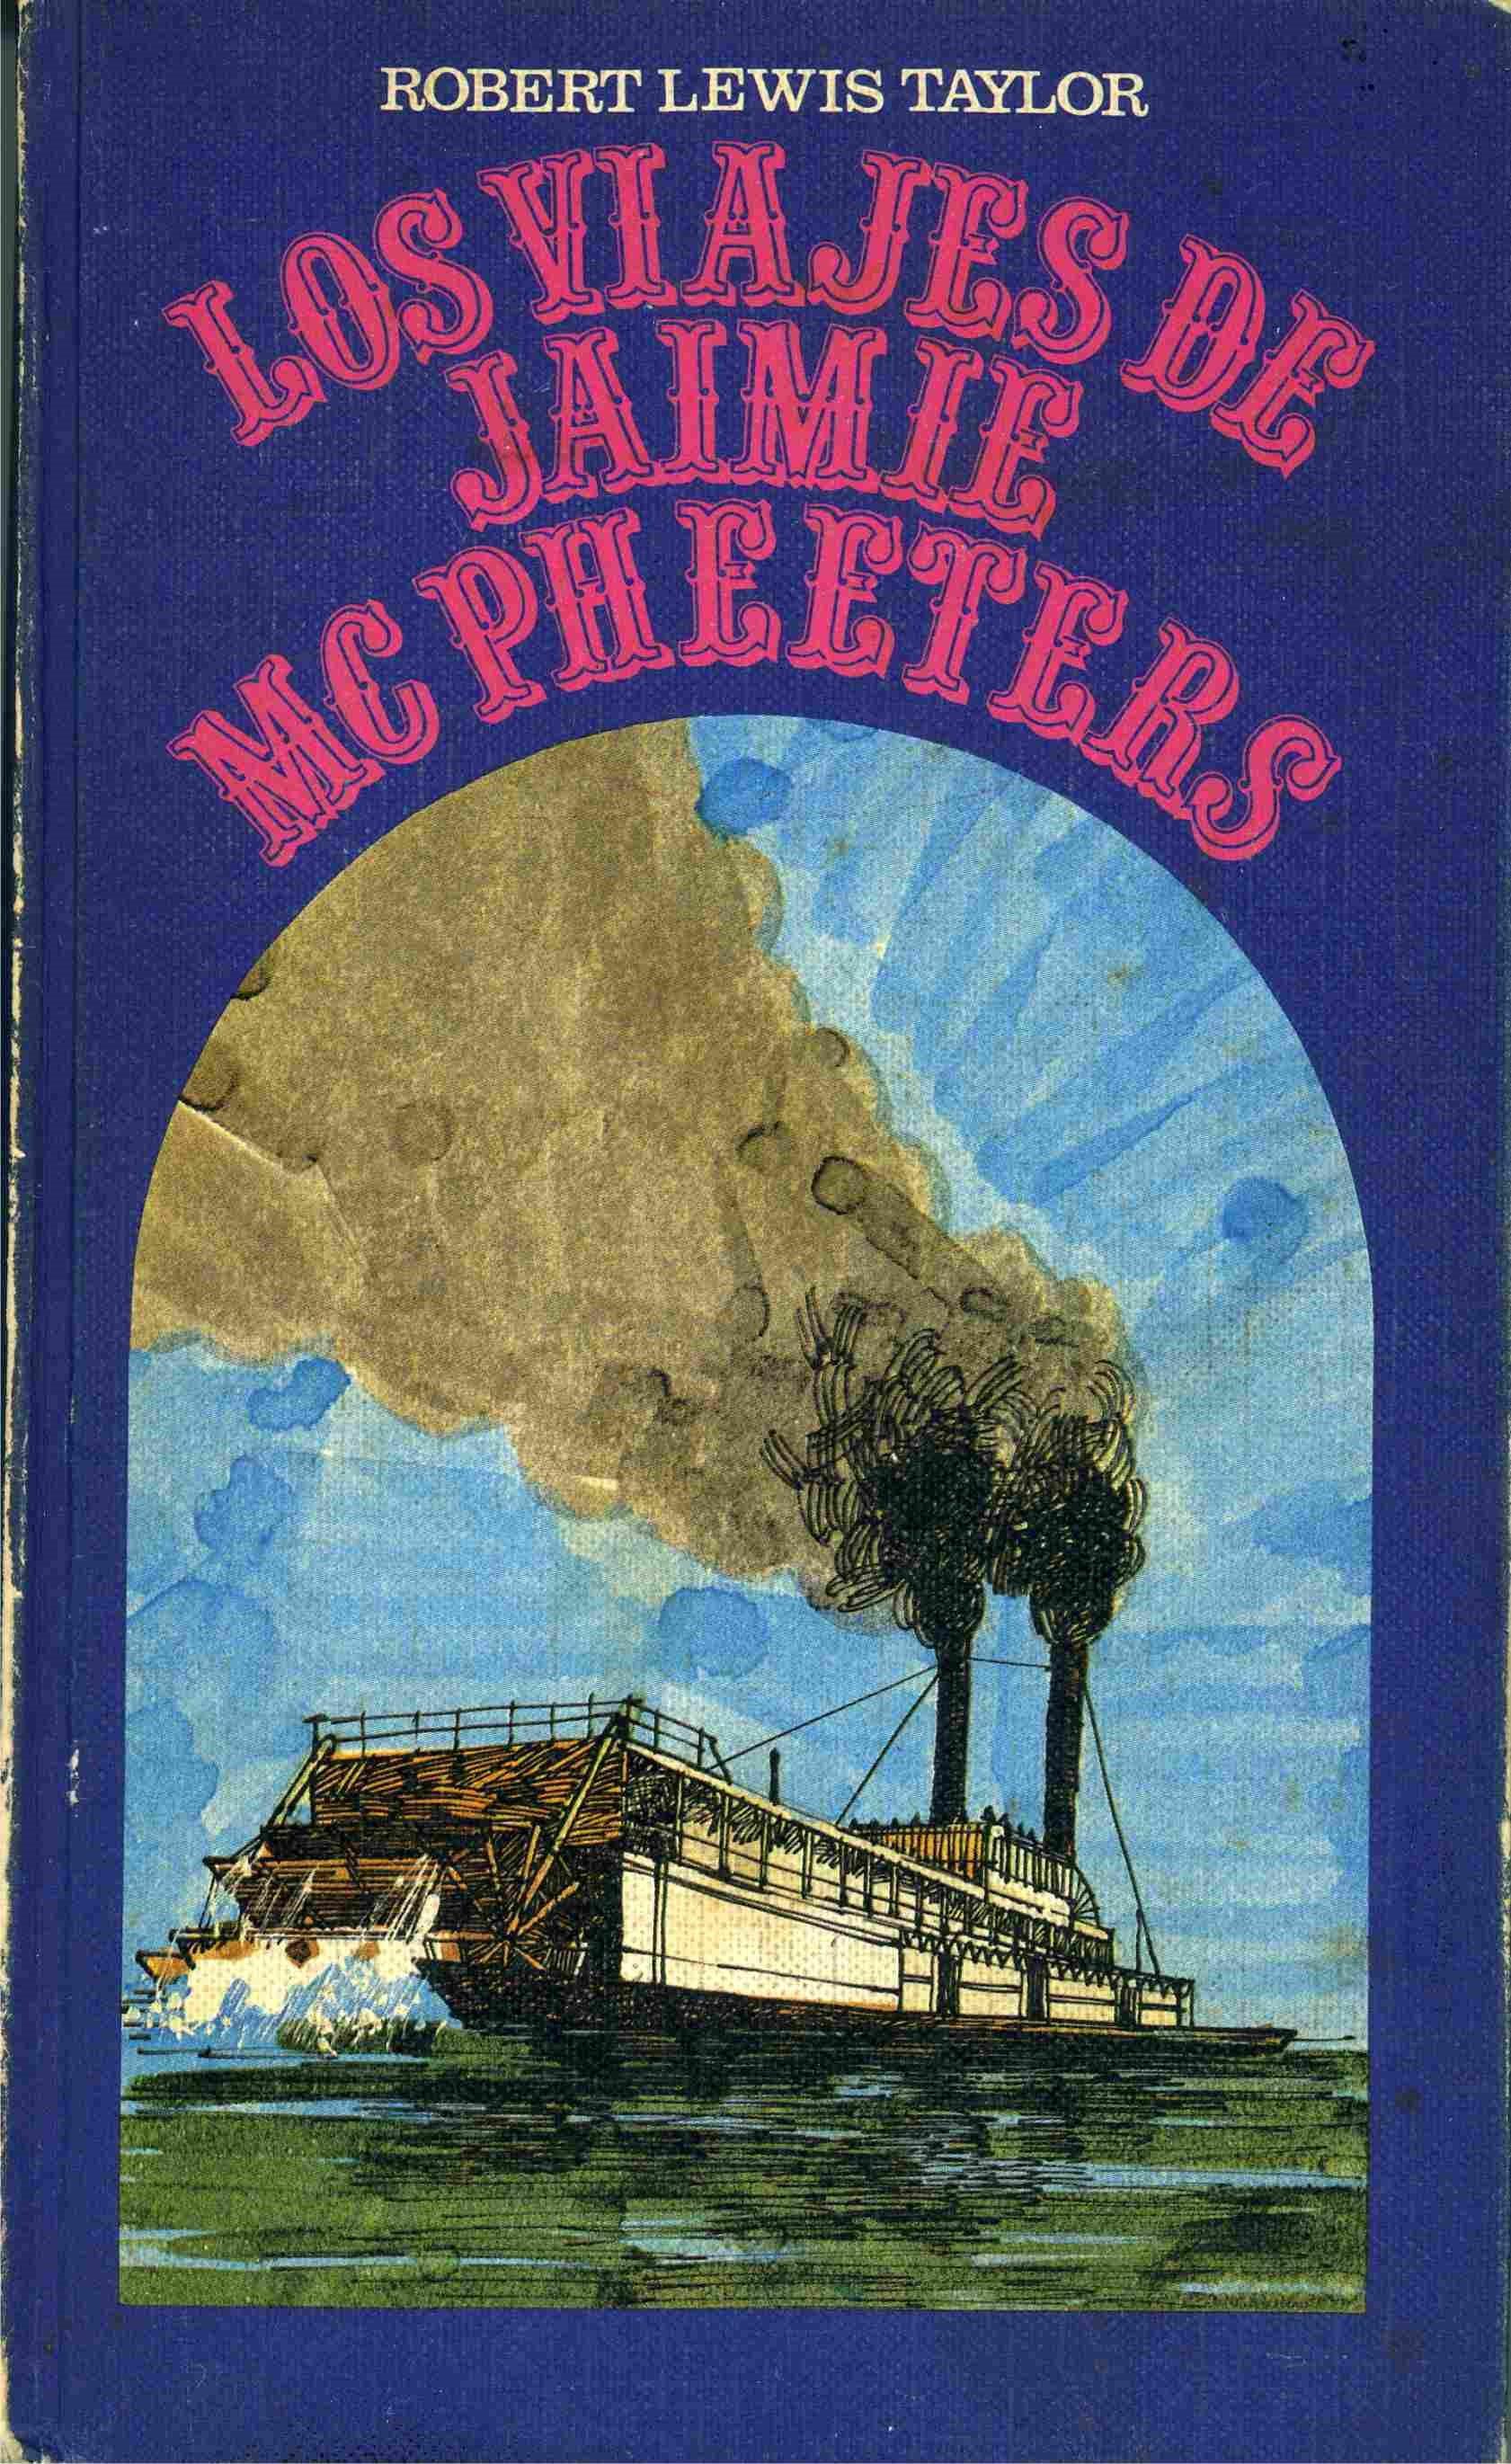 Los viajes de Jaimie Mac Pheeters